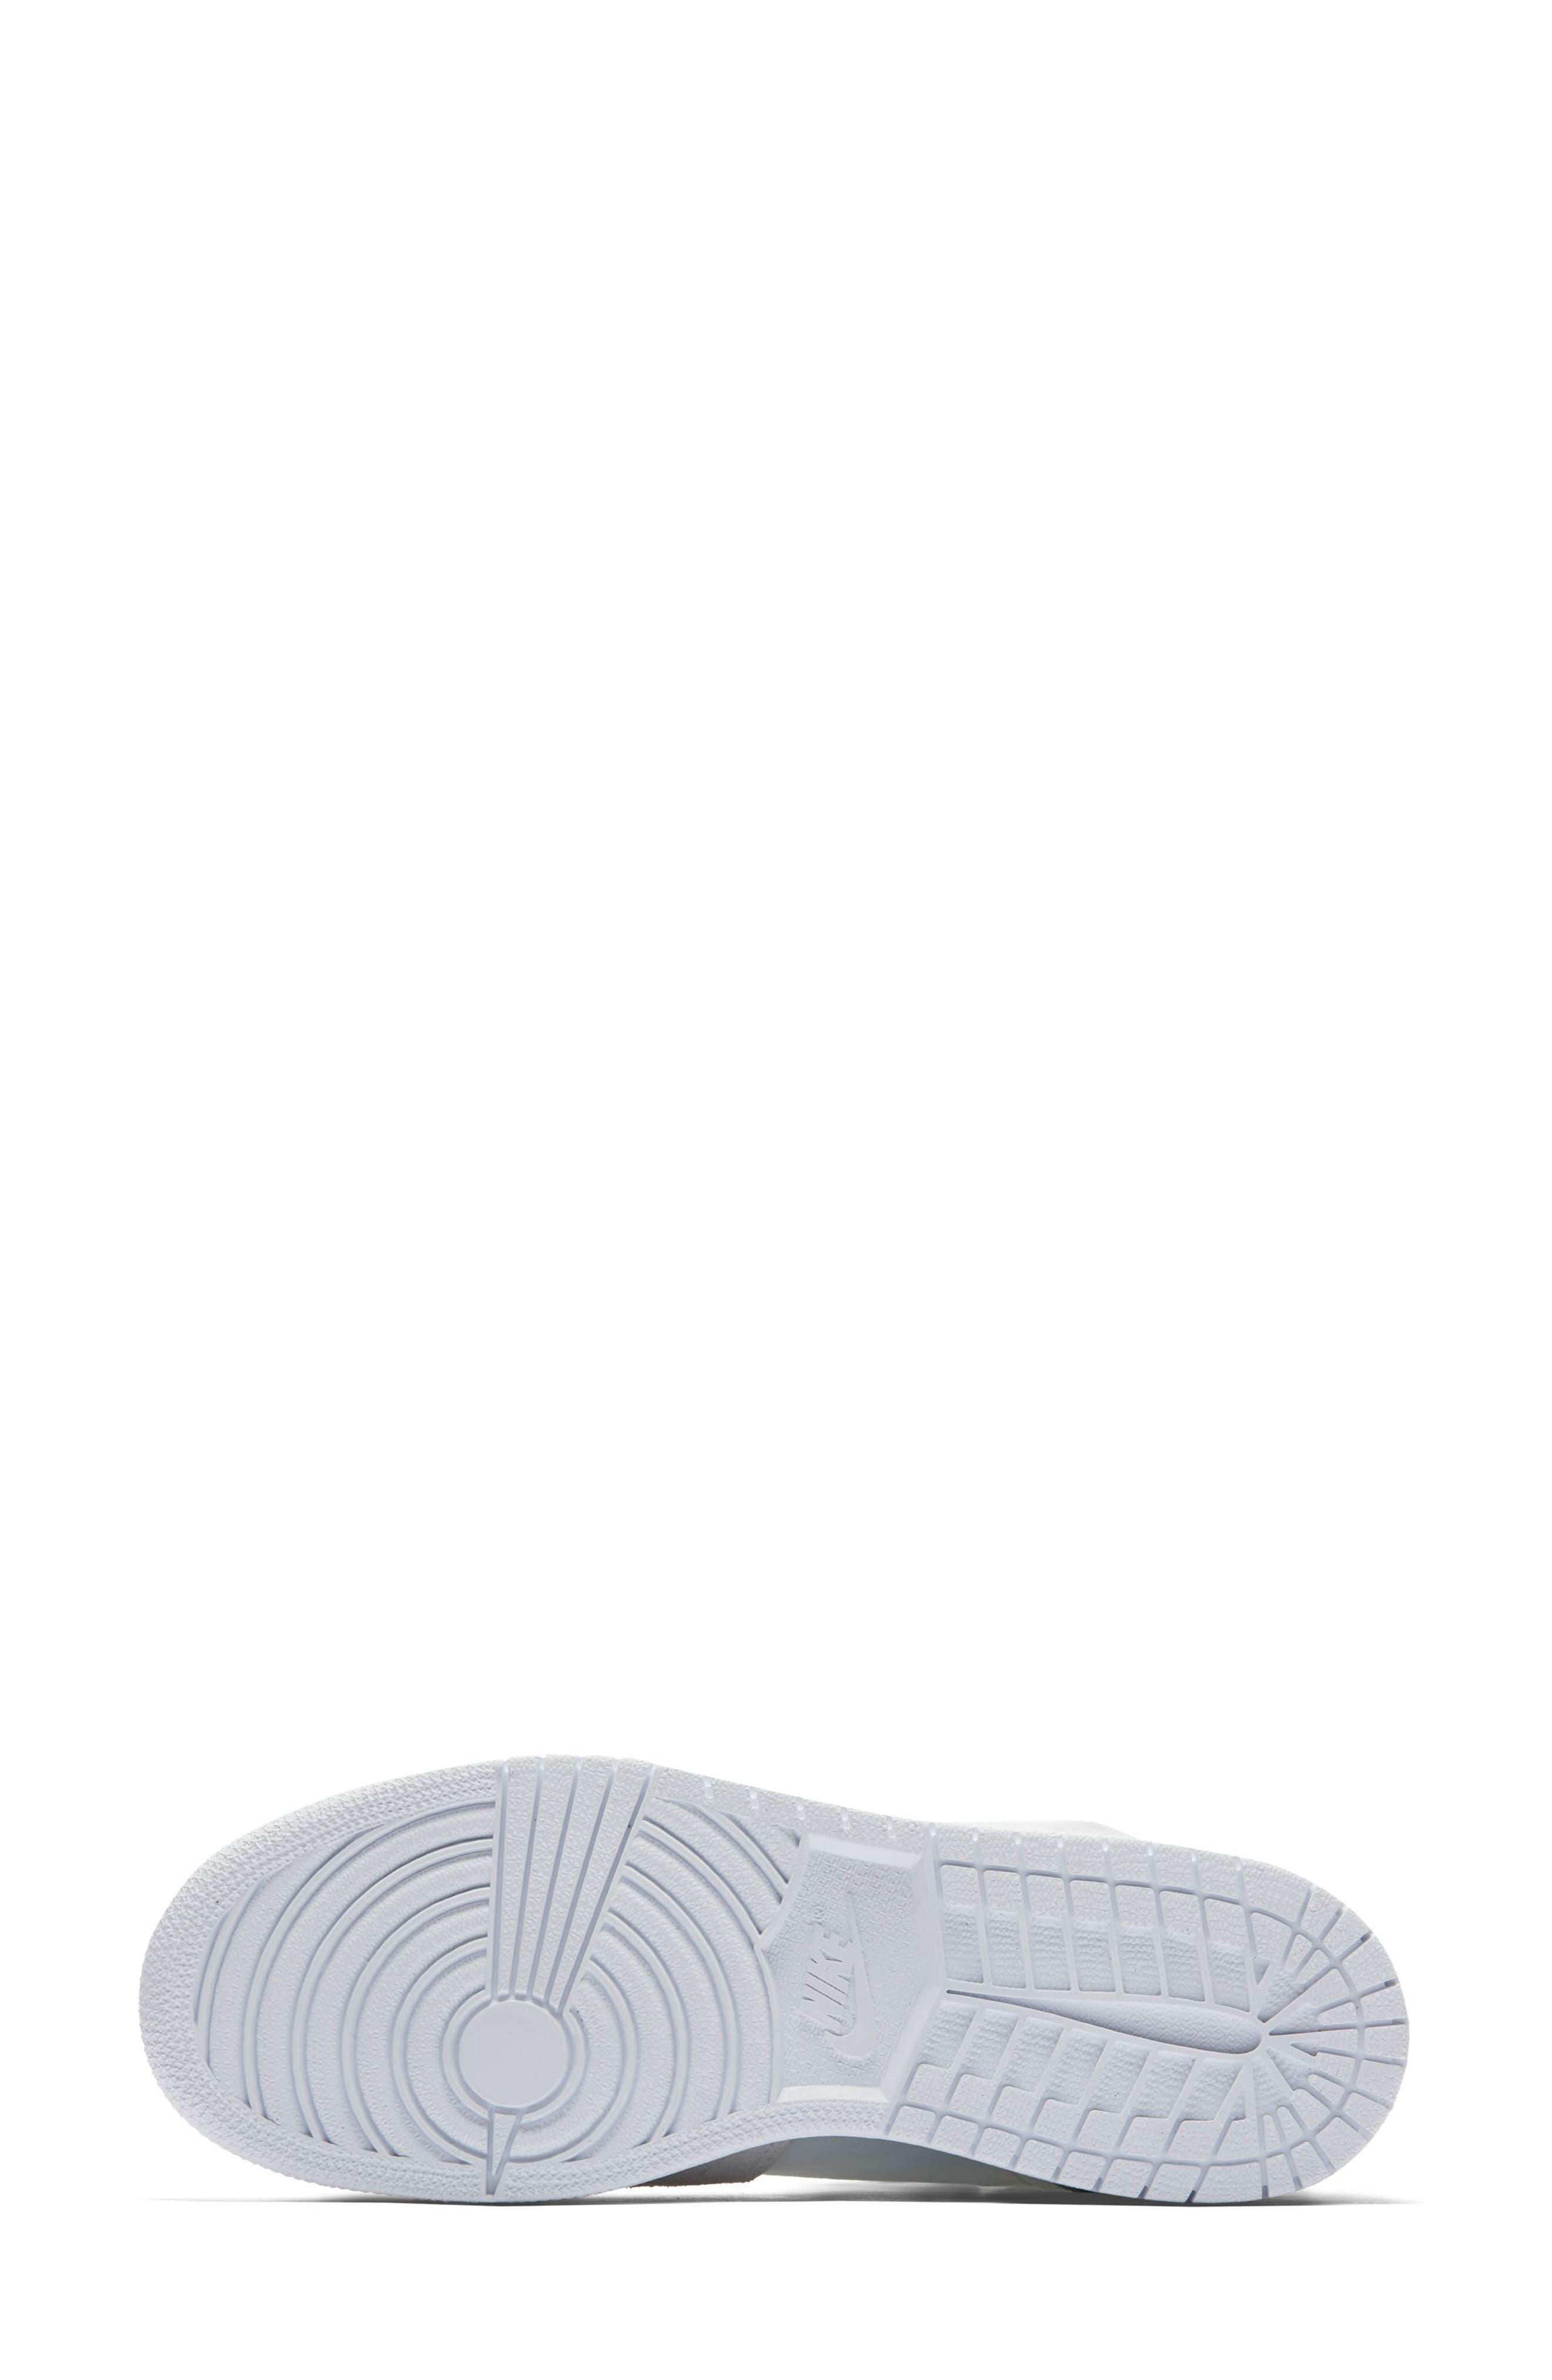 Air Jordan 1 Explorer XX Convertible High Top Sneaker,                             Alternate thumbnail 5, color,                             Off White/ Off White